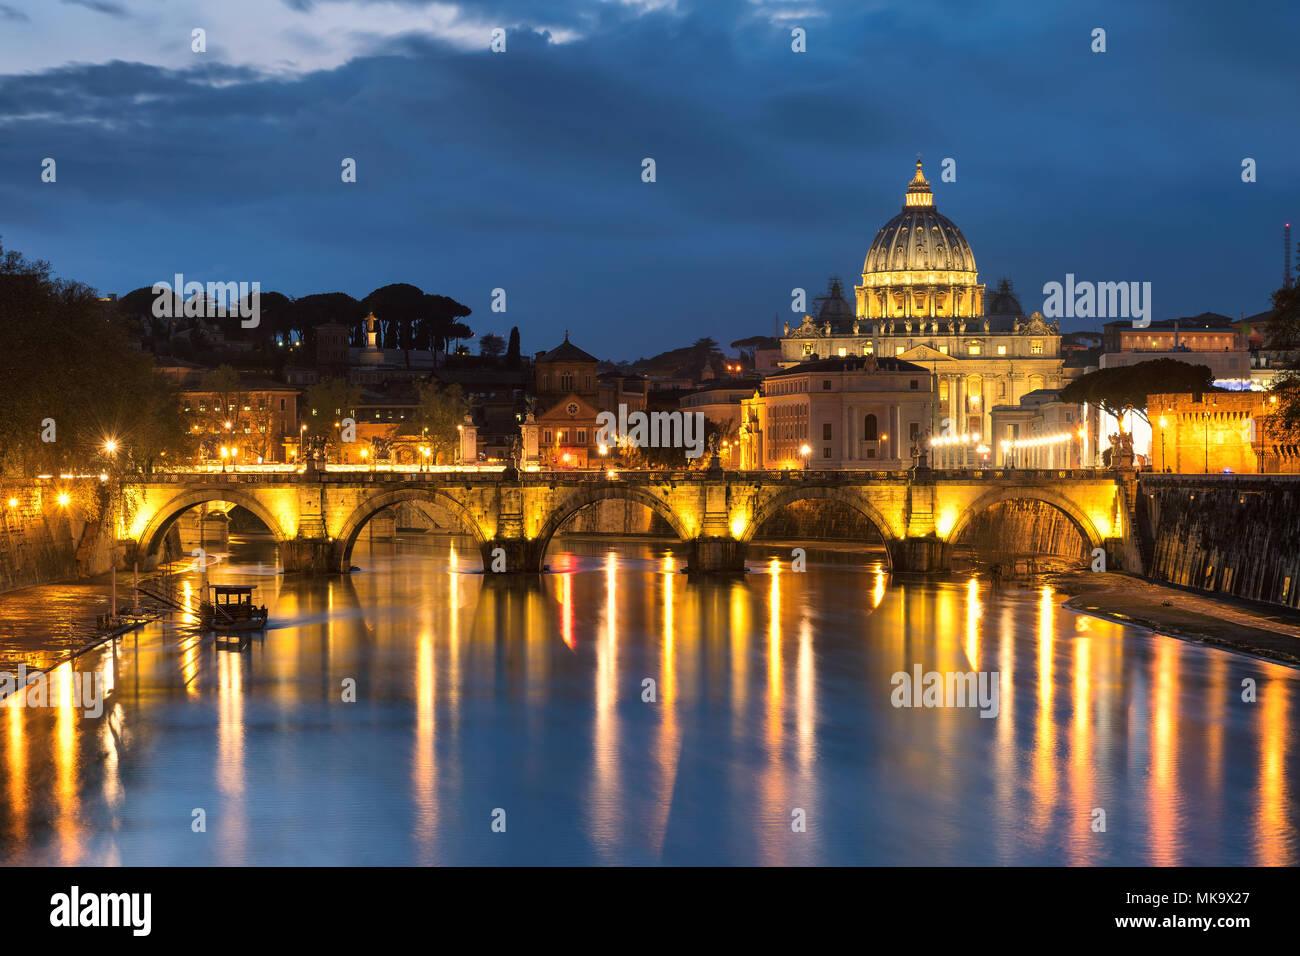 Nacht Blick auf den Tiber und den Petersdom in Rom, Italien. Stockbild